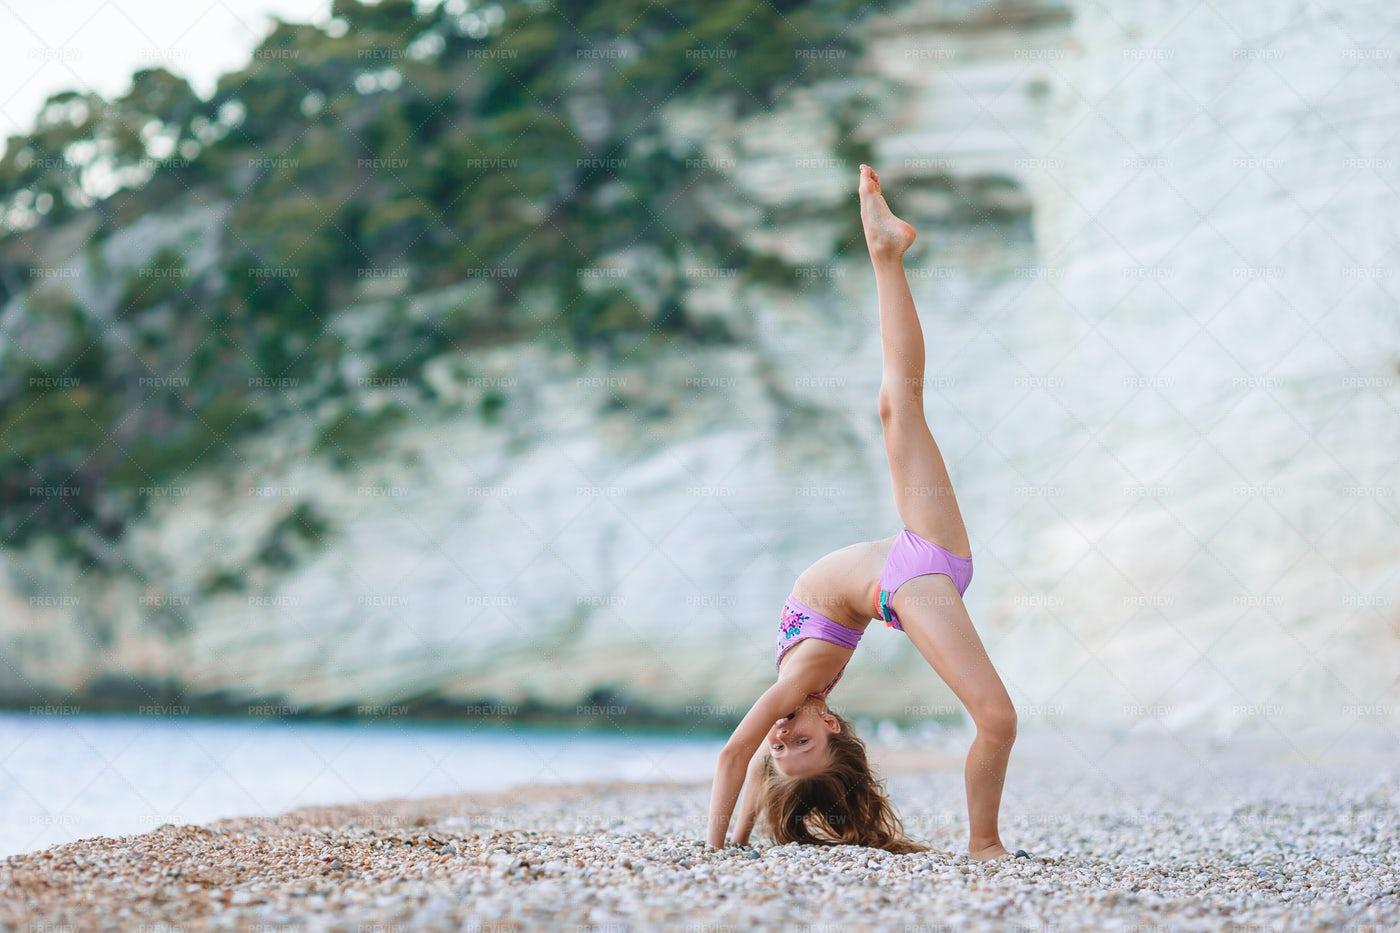 Sporty Girl At The Beach: Stock Photos